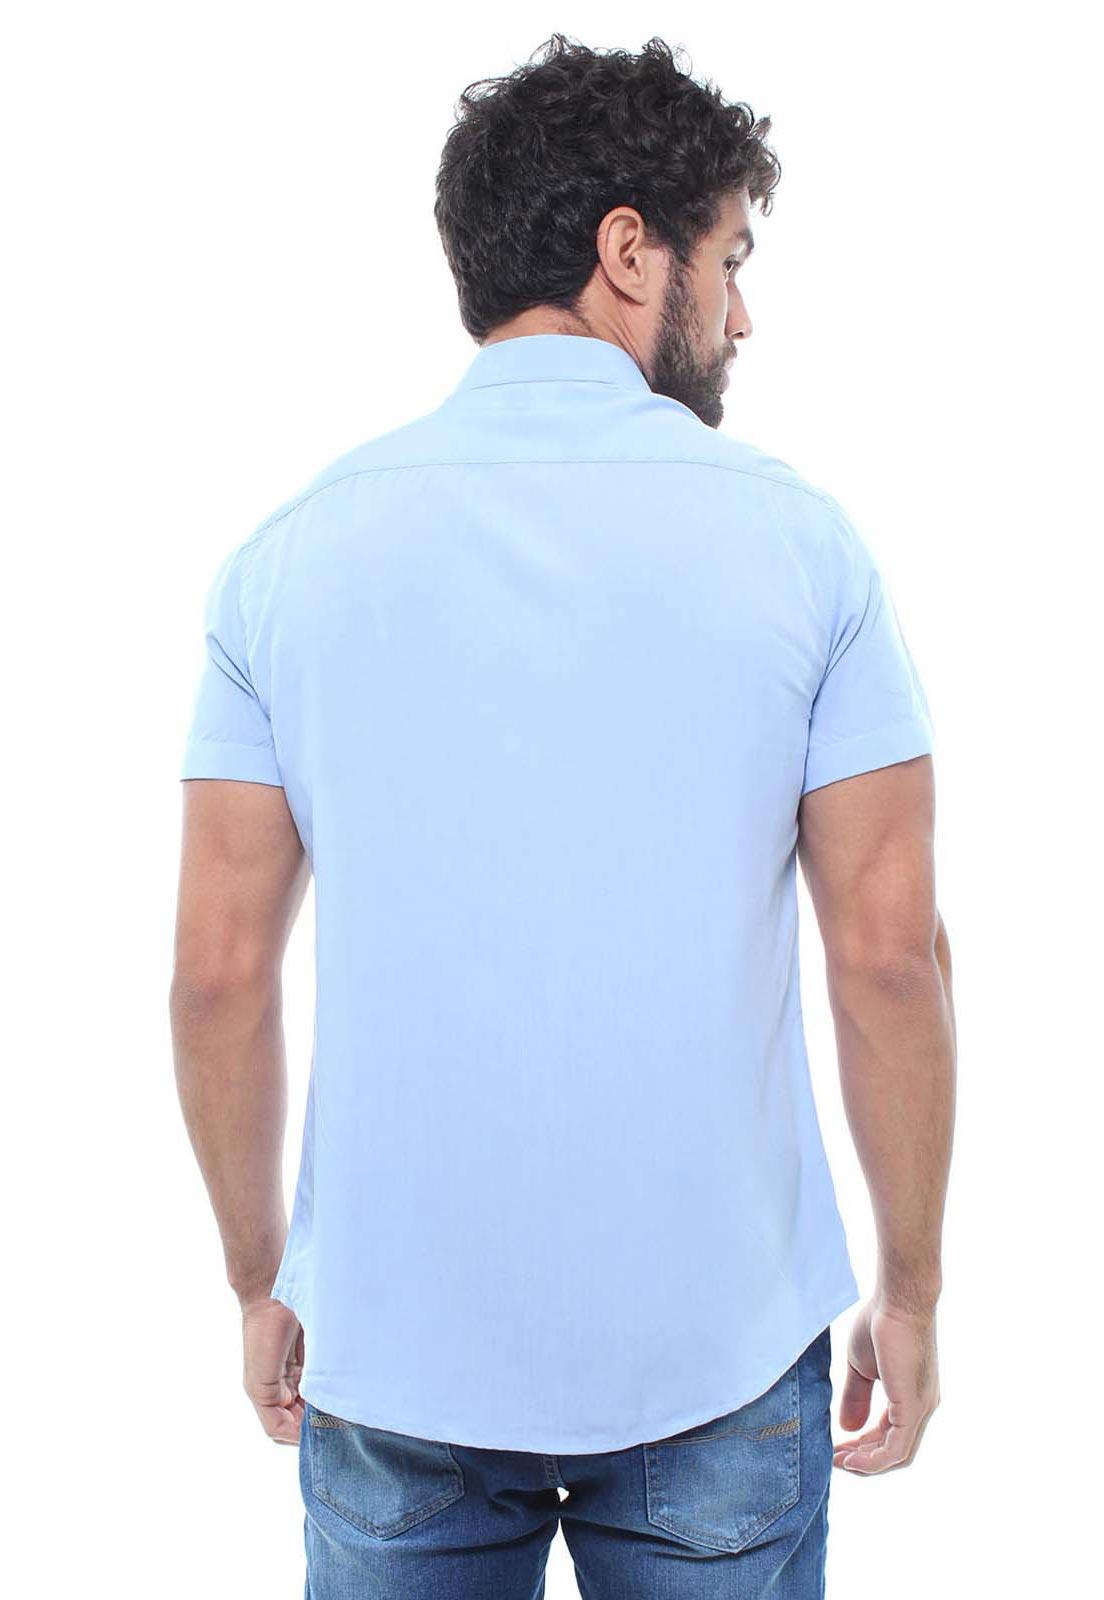 Camisa  Masculina Manga Curta Crocker -  47815  - CROCKER JEANS